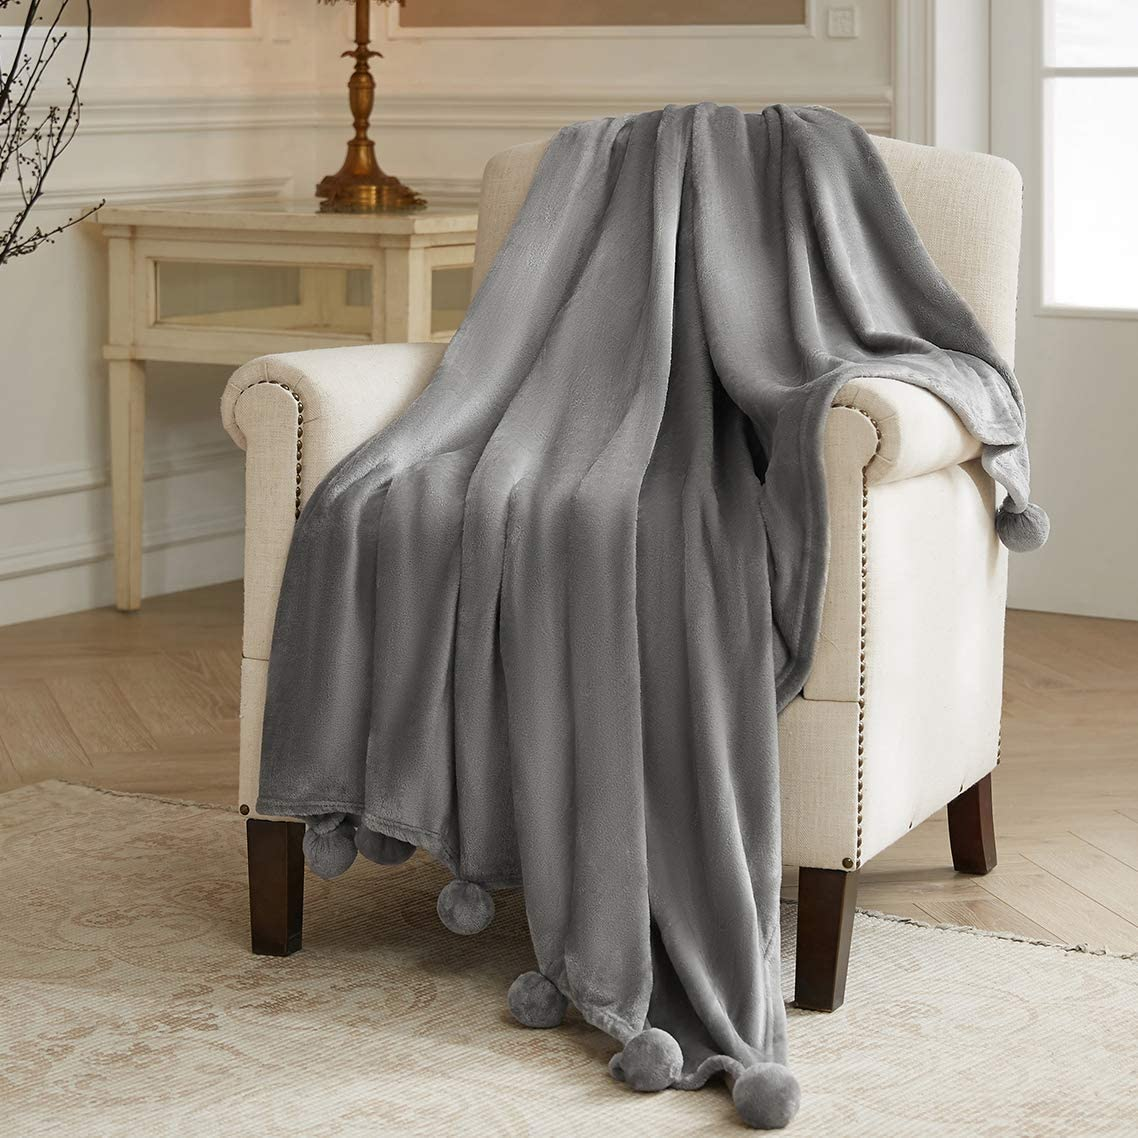 Blue Extra Soft Brushed Microfiber Size 50x60 Sedona House Polar Fleece Premium Bed Throw Blanket